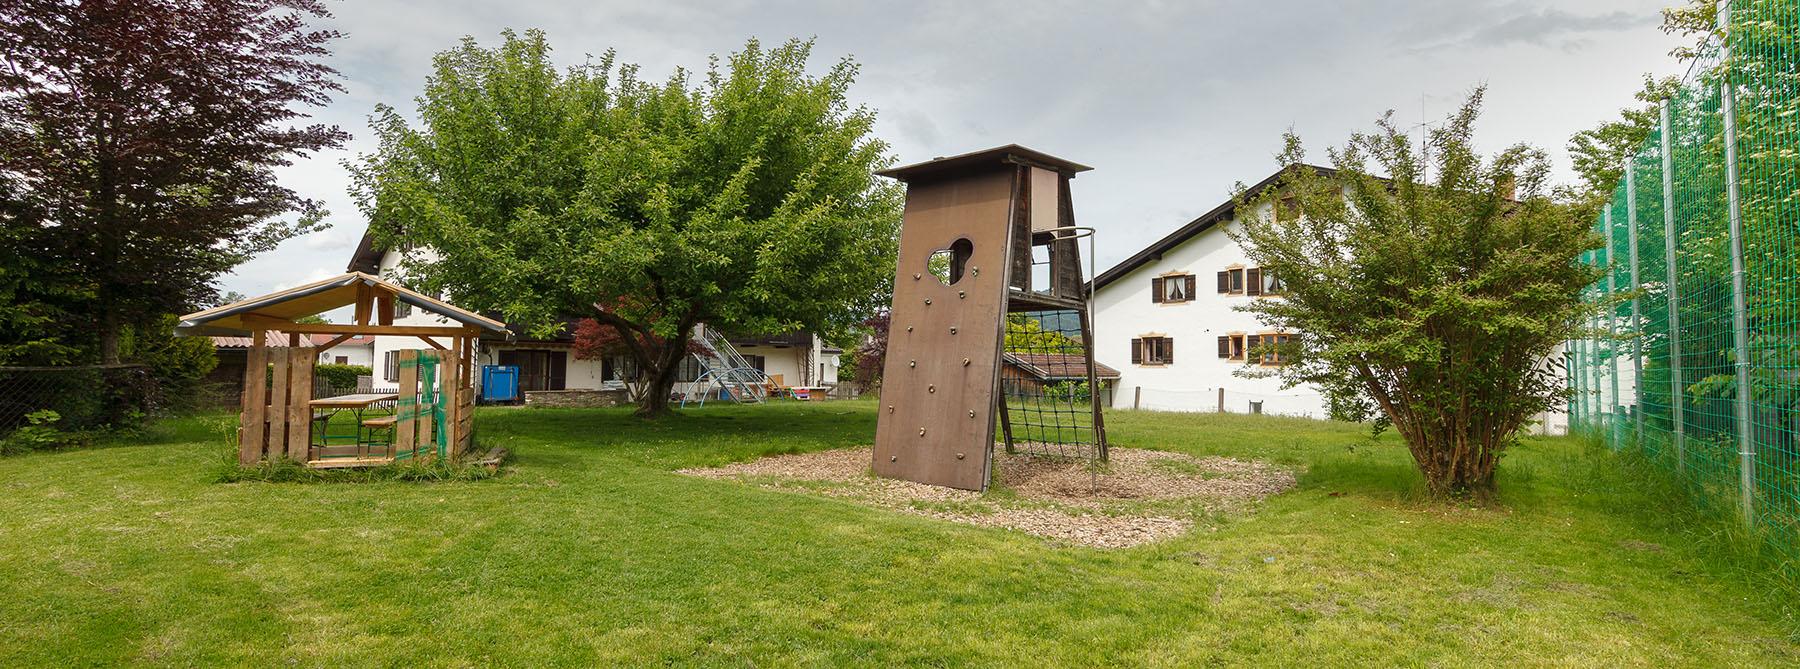 Audorfer-Kindernest3-Kindergarten-Kinderkrippe-Kinderhort